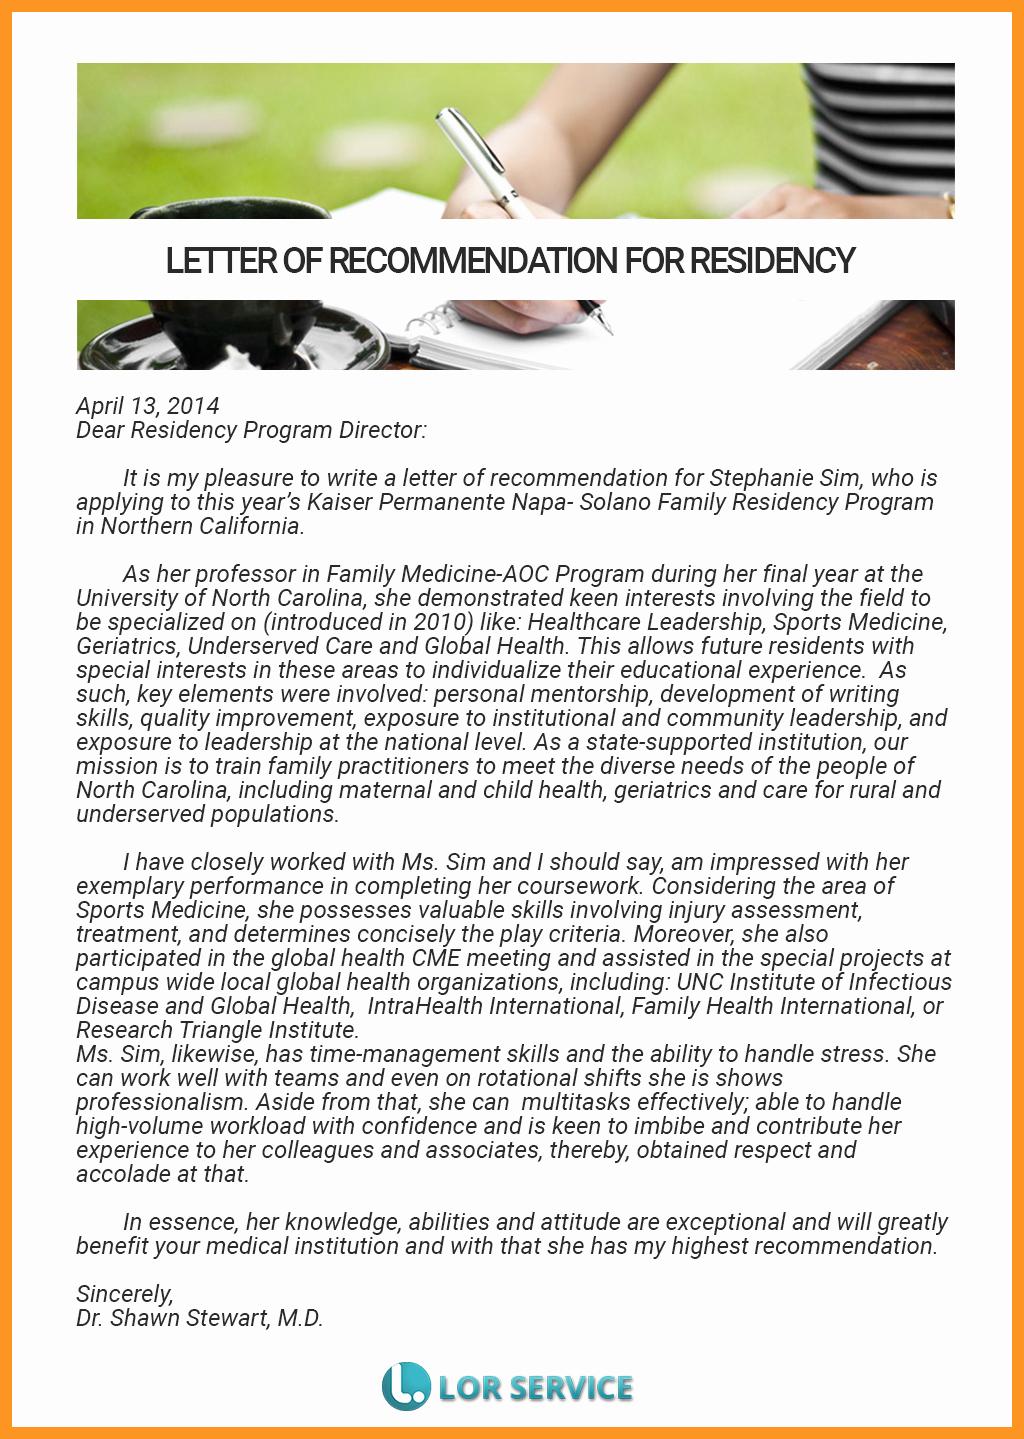 Sample Letter Of Recommendation Residency Awesome Re Mendation Letter for Residency